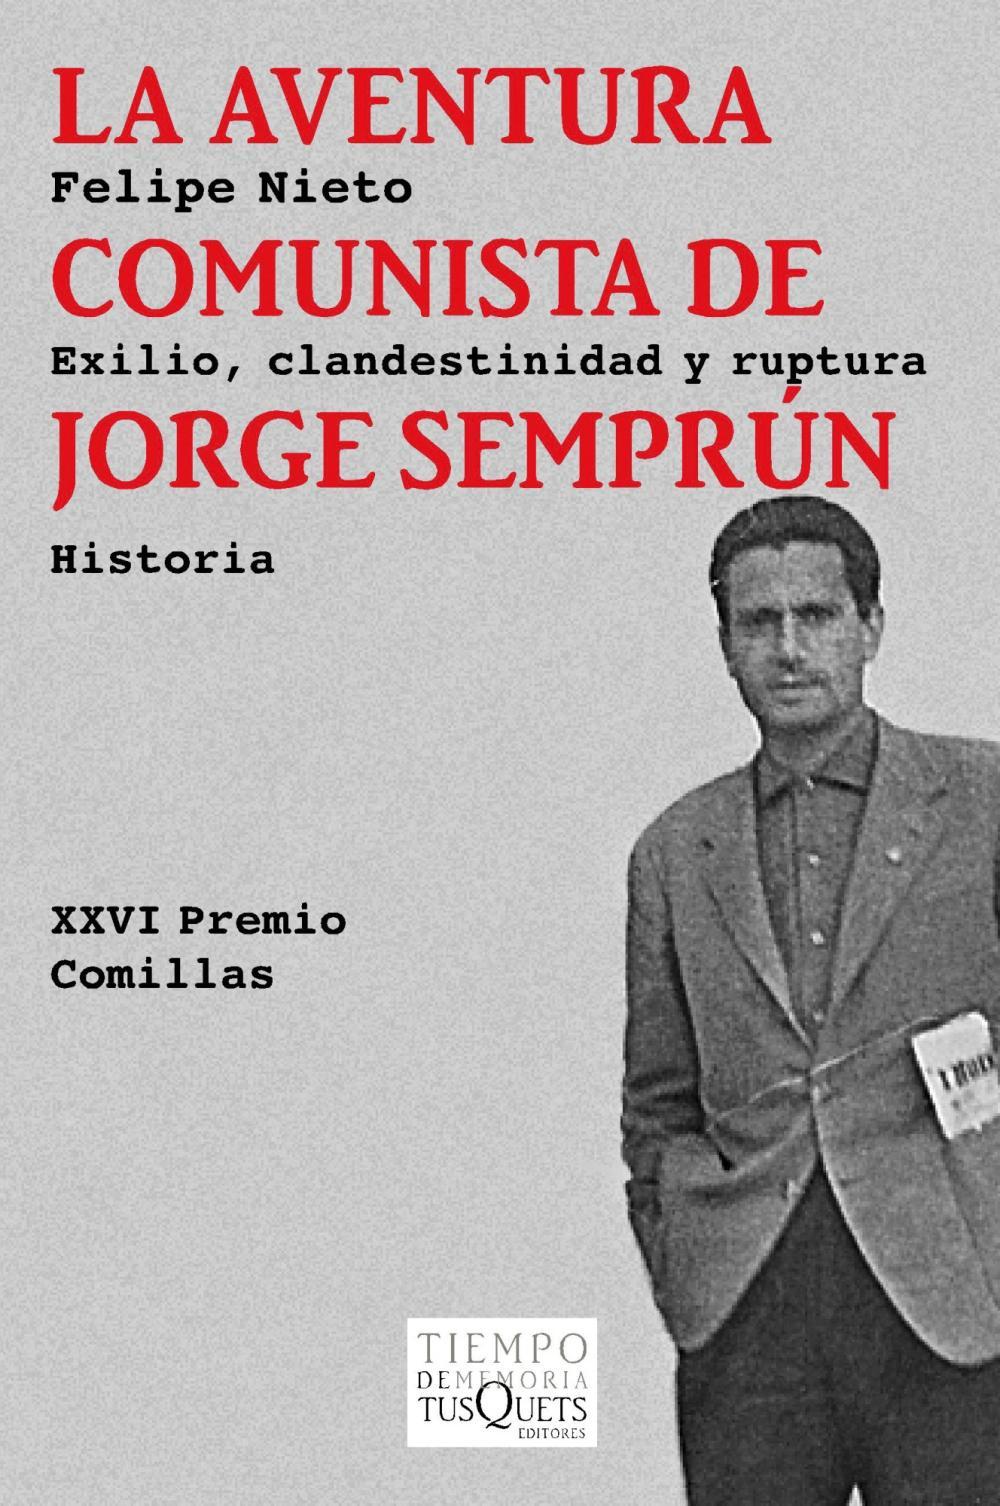 La aventura comunista de Jorge Semprún